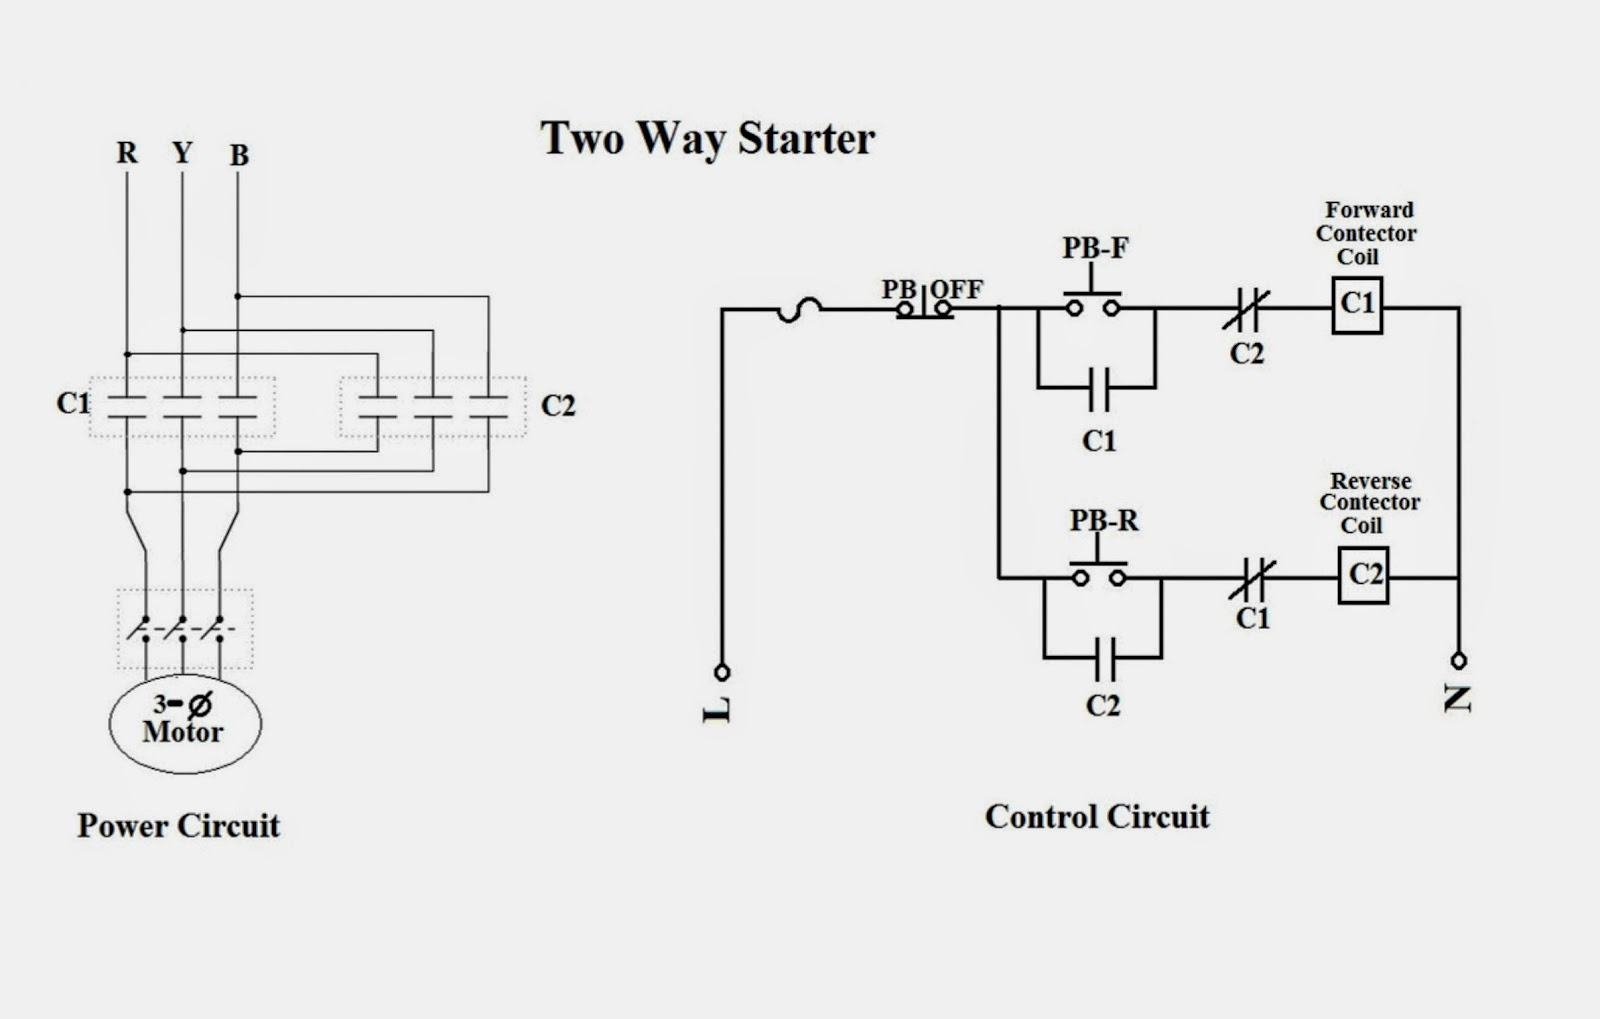 hight resolution of 300zx hks turbo timer wiring diagram wiring libraryturbo timer wiring diagram training report on bokaro steel